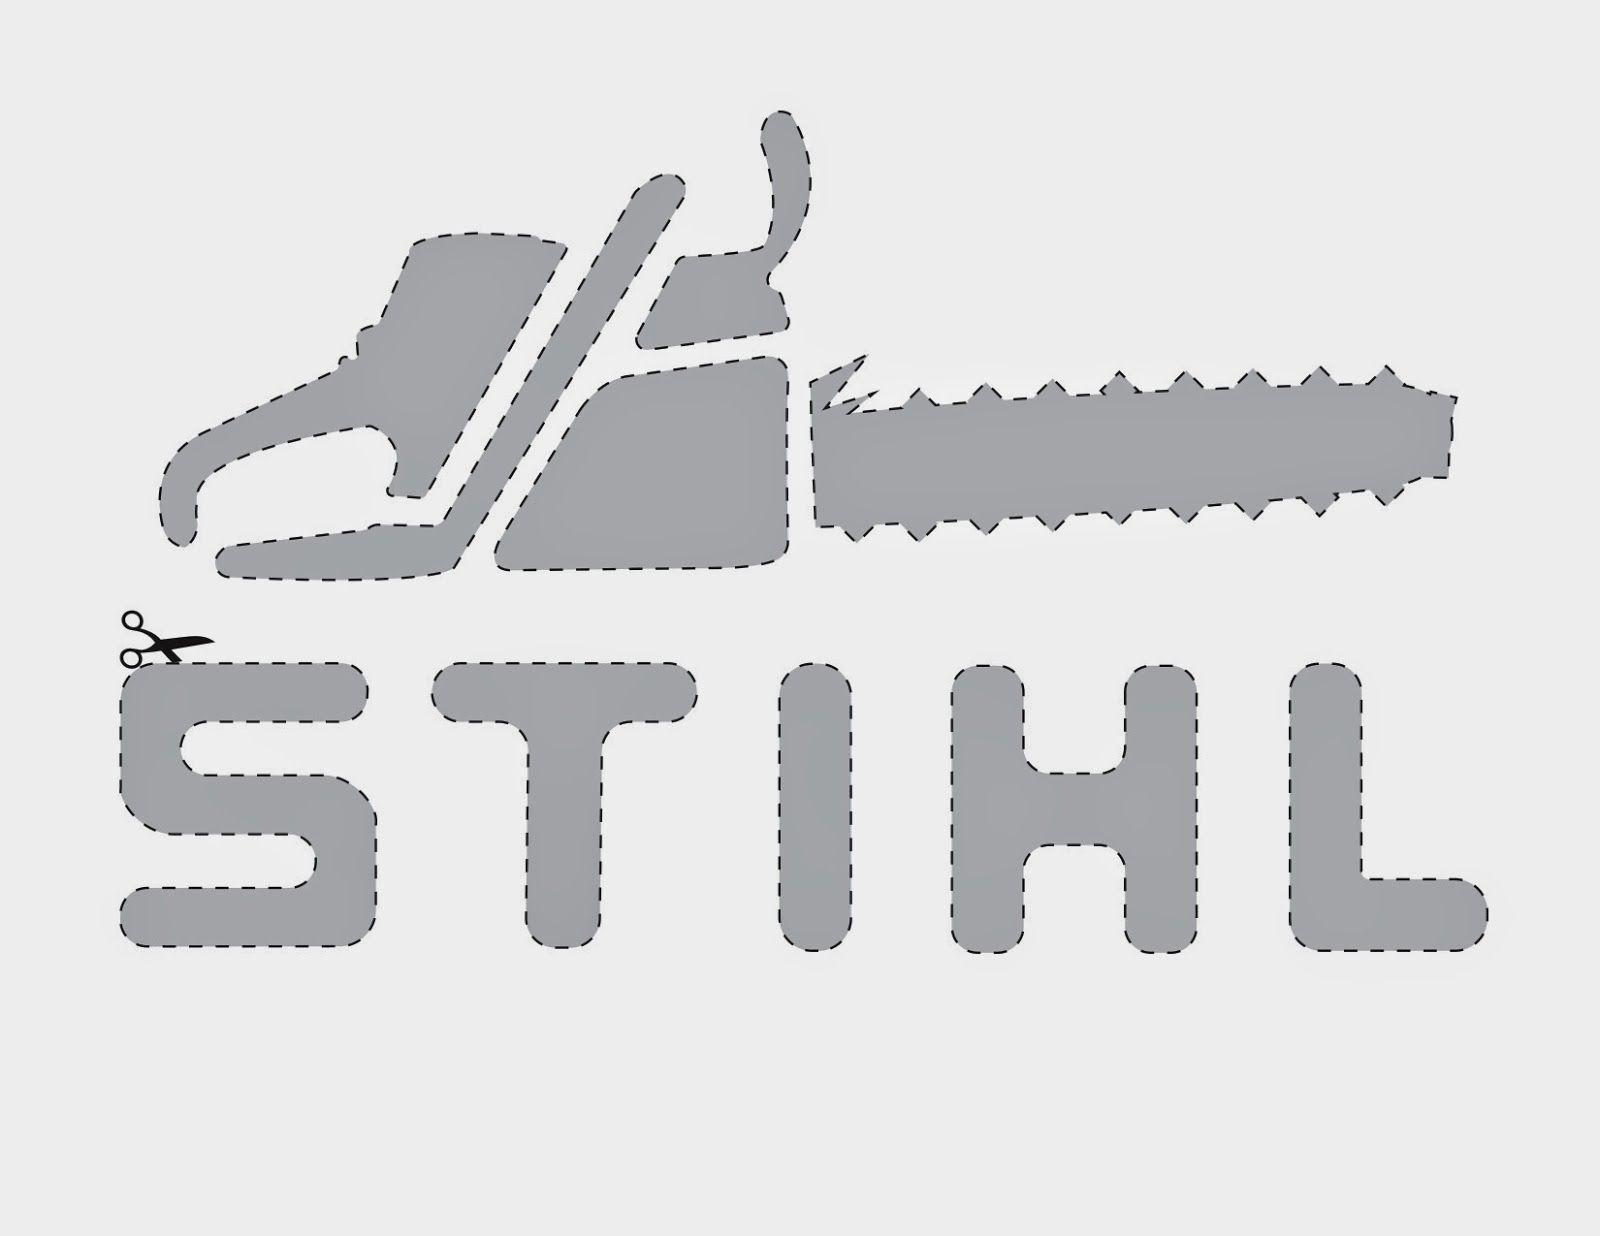 Https Www Google Ca Blank Html Stihl Chainsaw Stihl Chainsaw